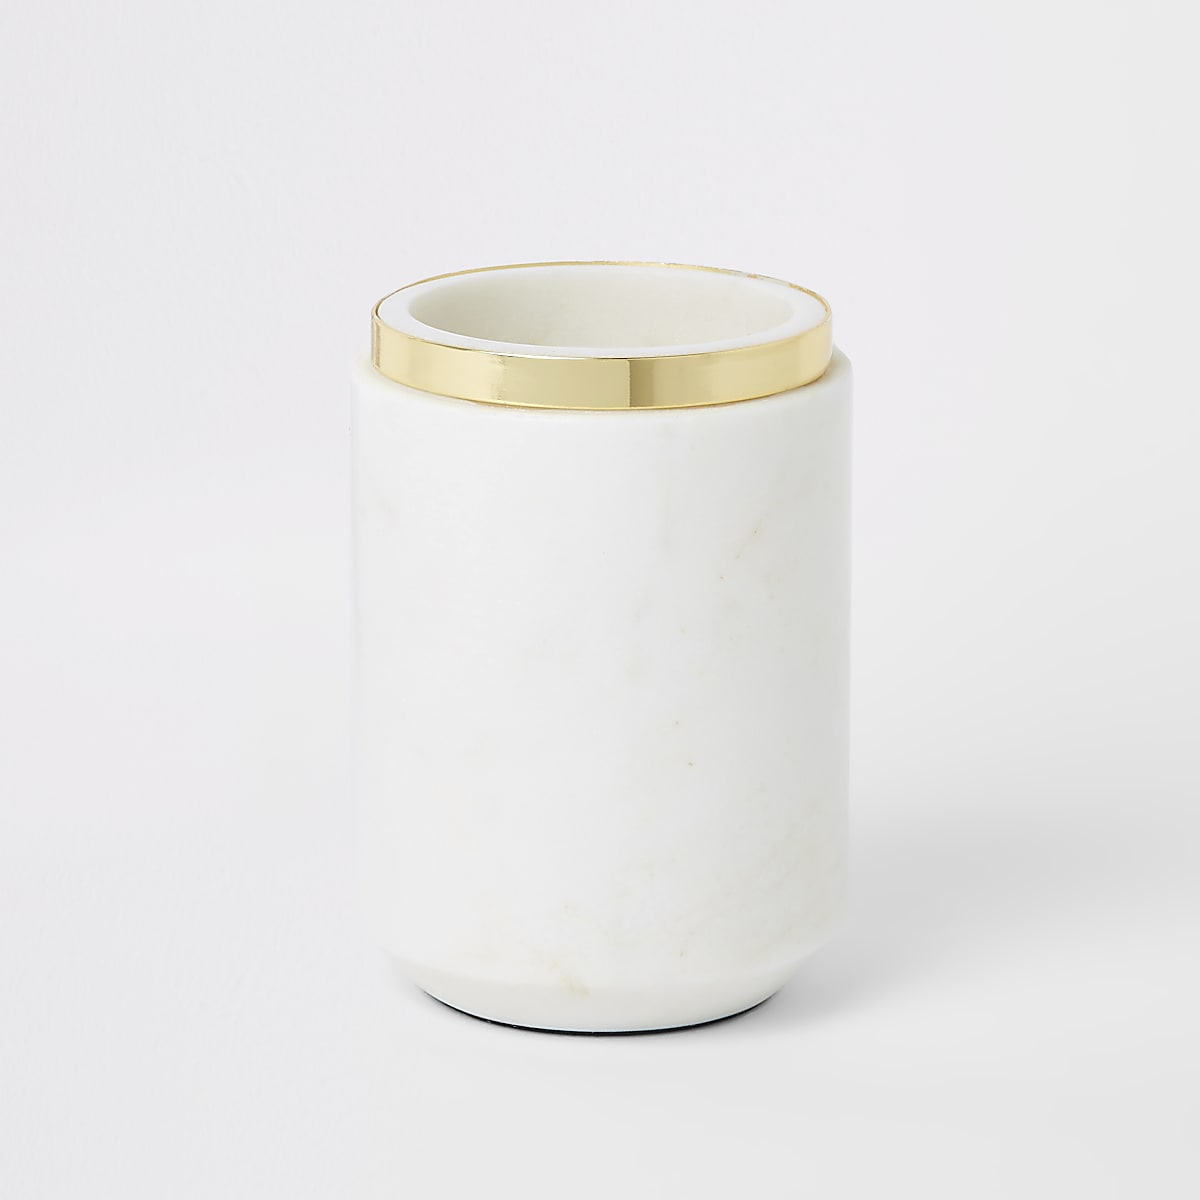 Vase en marbre à bord métallisé